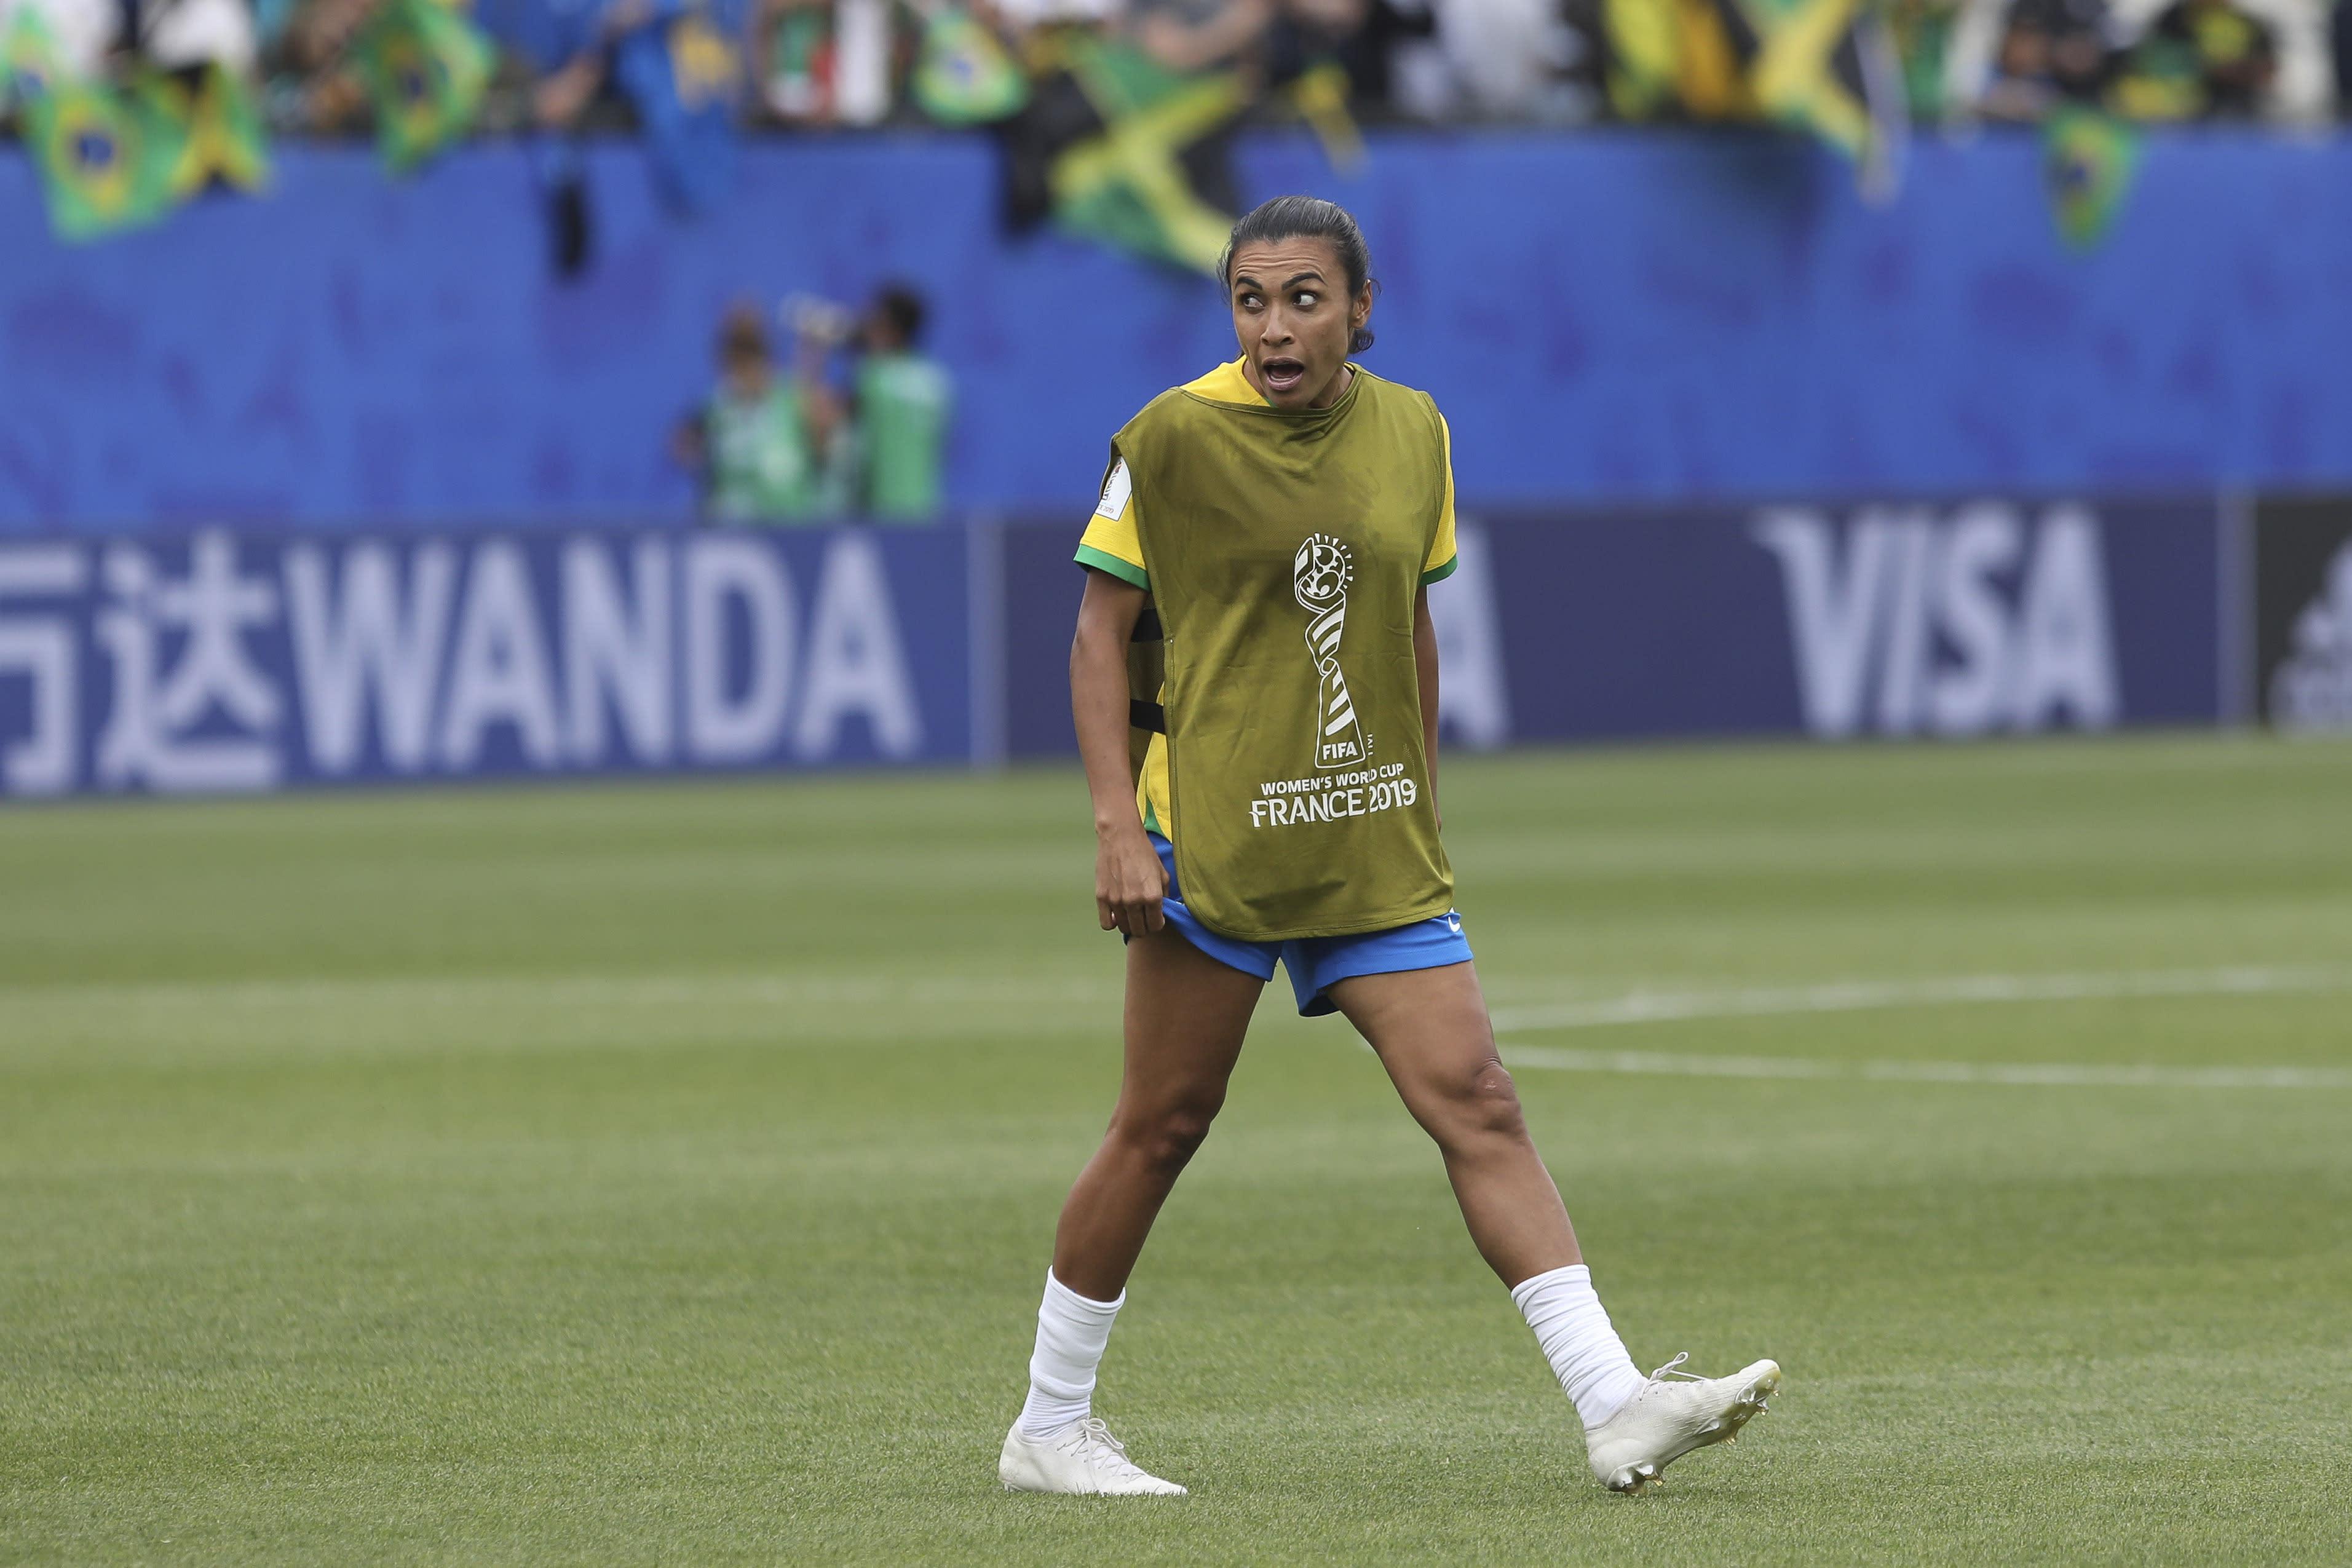 Brazil unsure if Marta will play against Australia